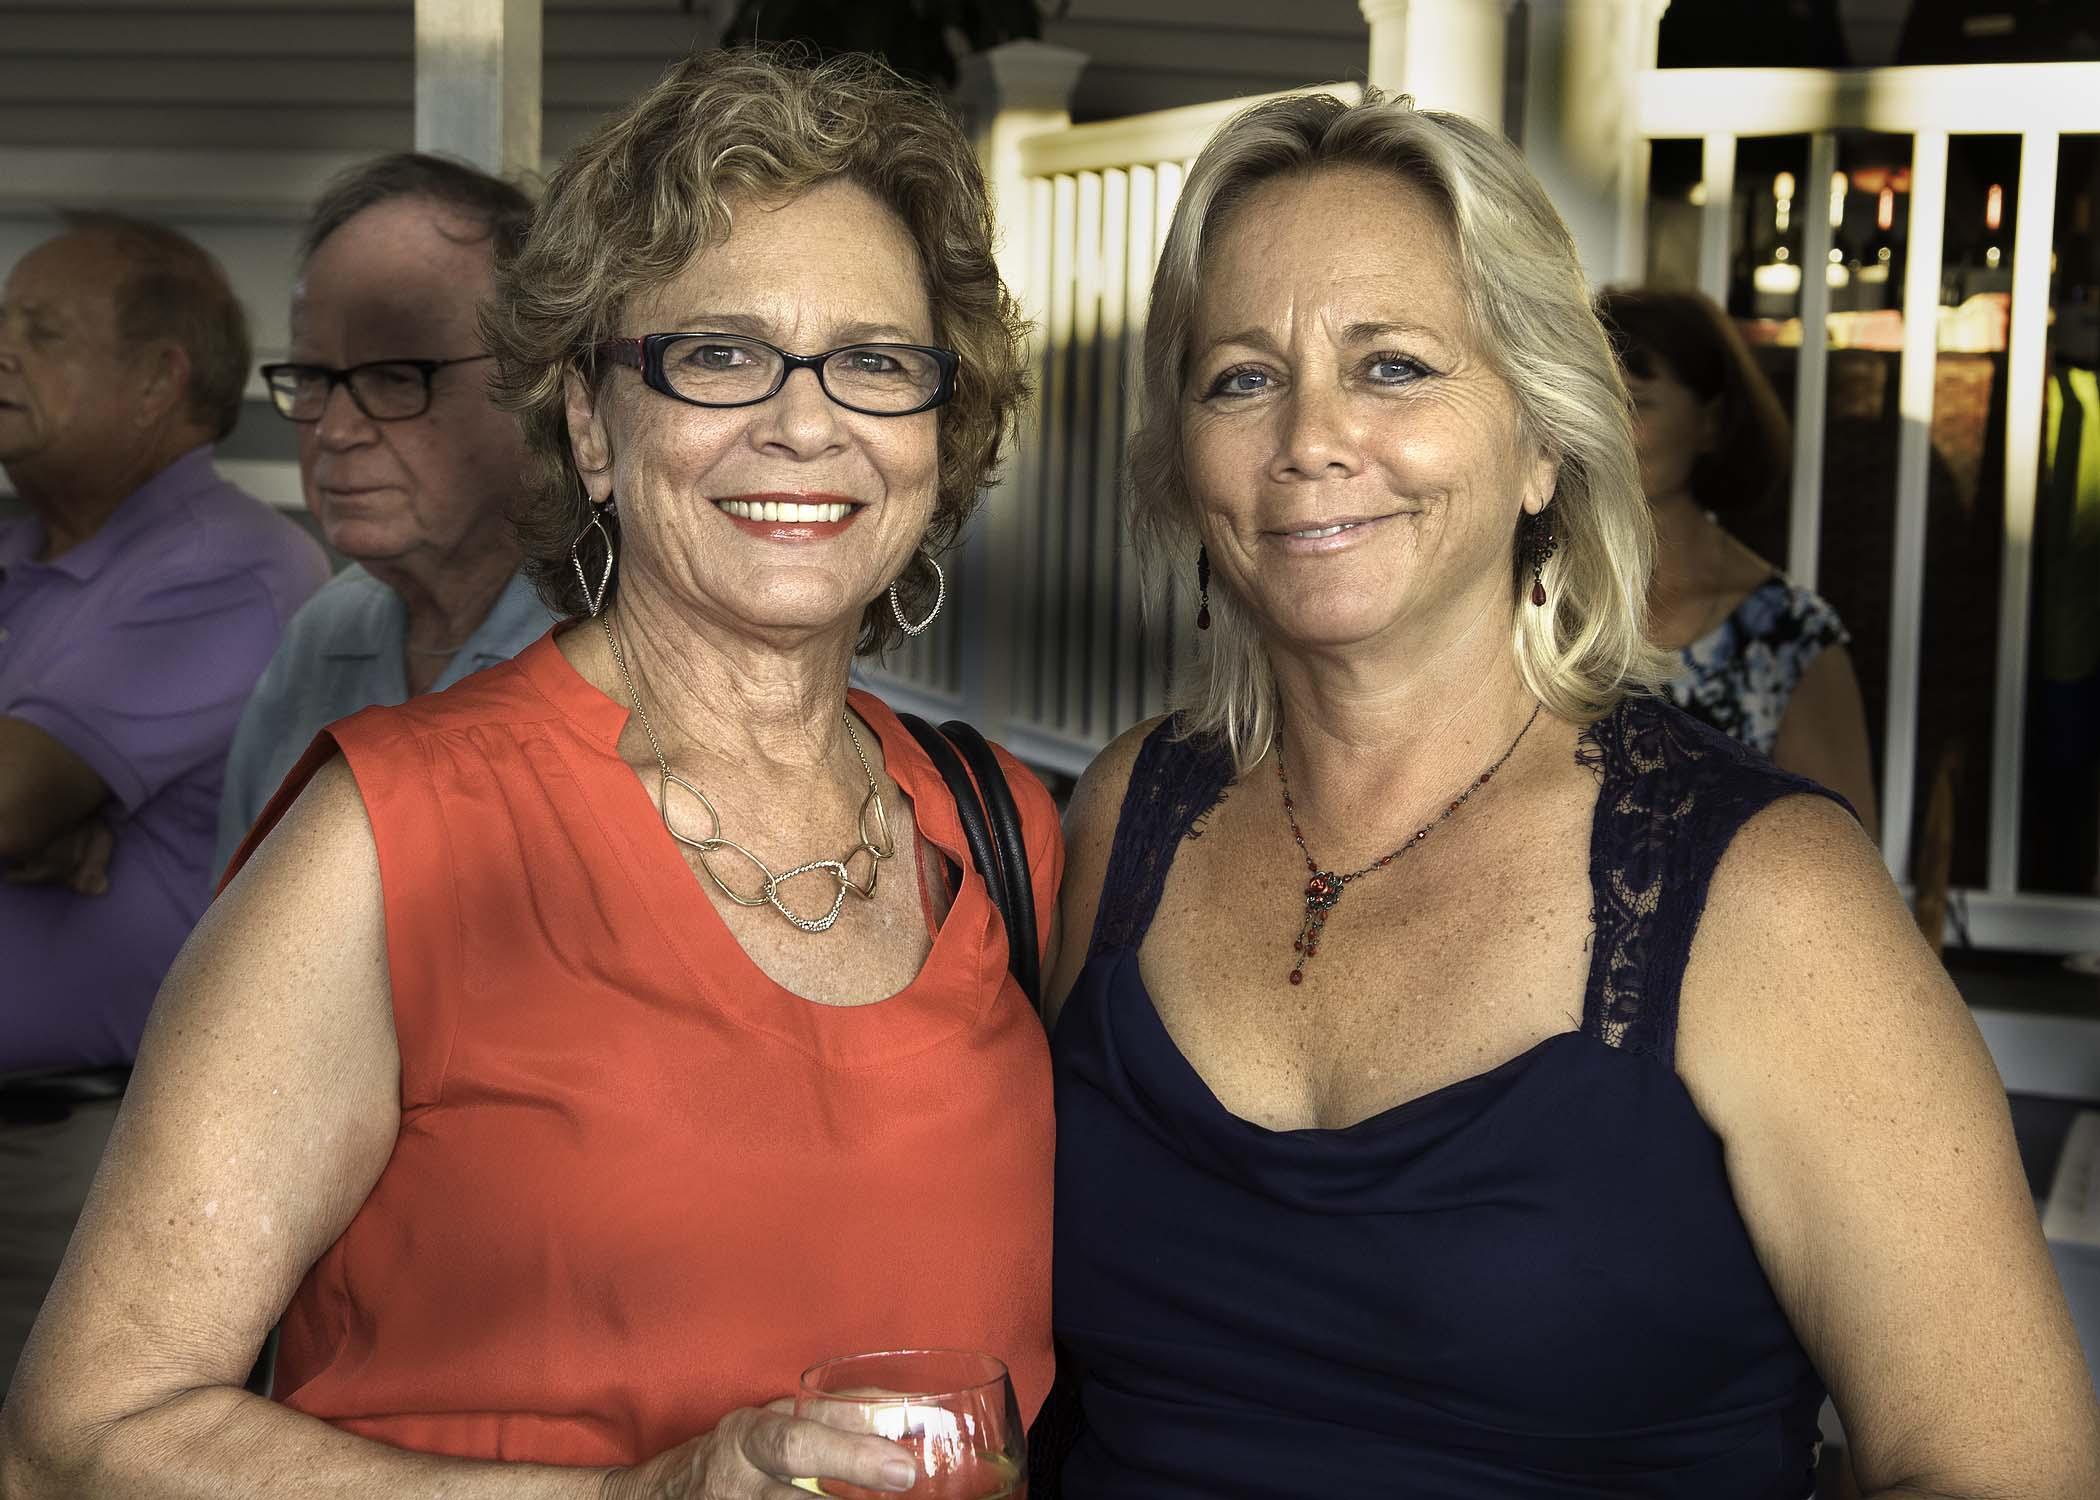 (L-R) Gloria Krekel and Debi Almeida